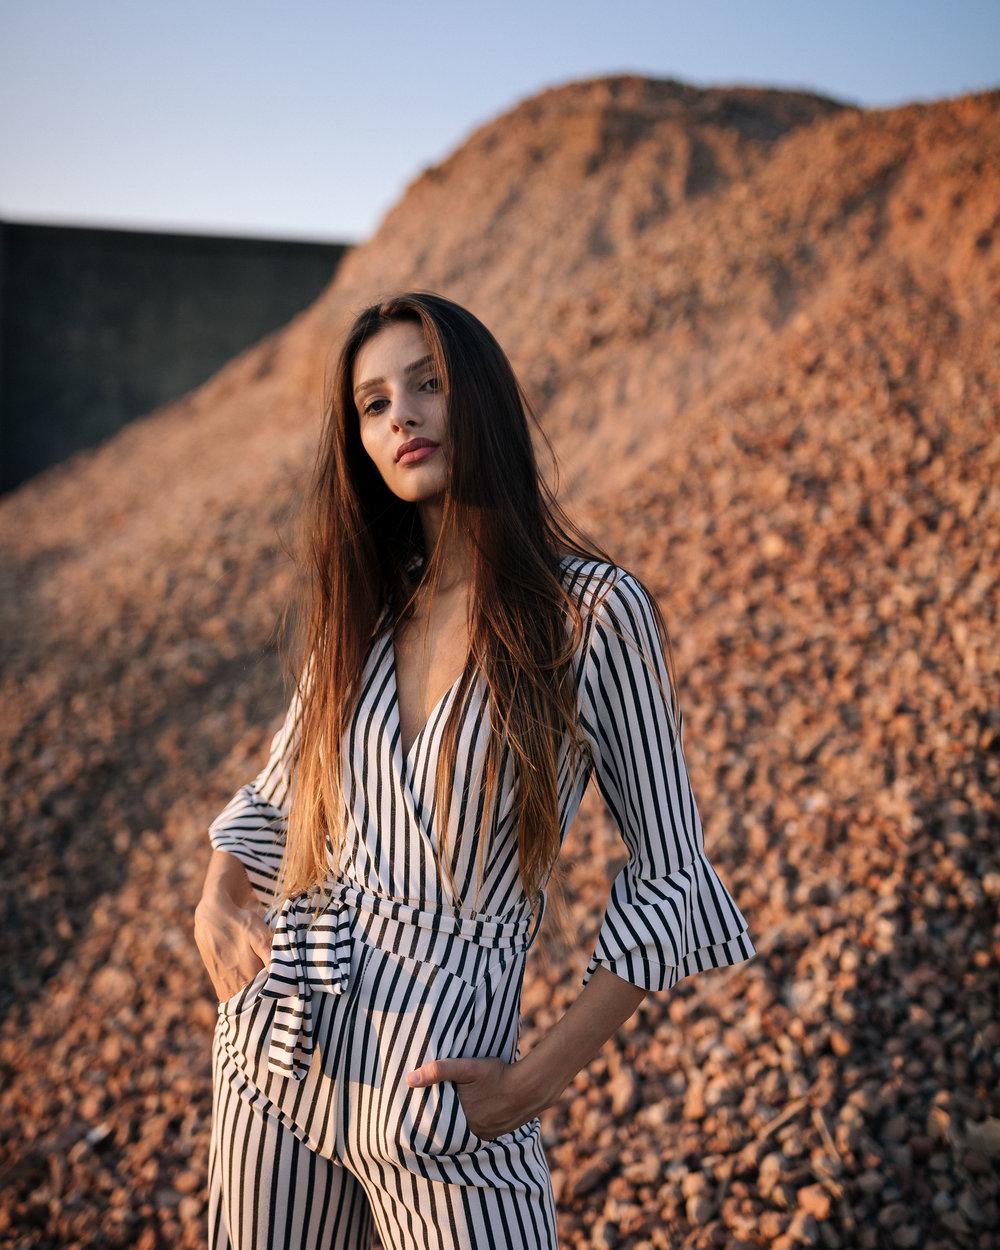 photographer-editorial-portrait-fashion-1-4.jpg